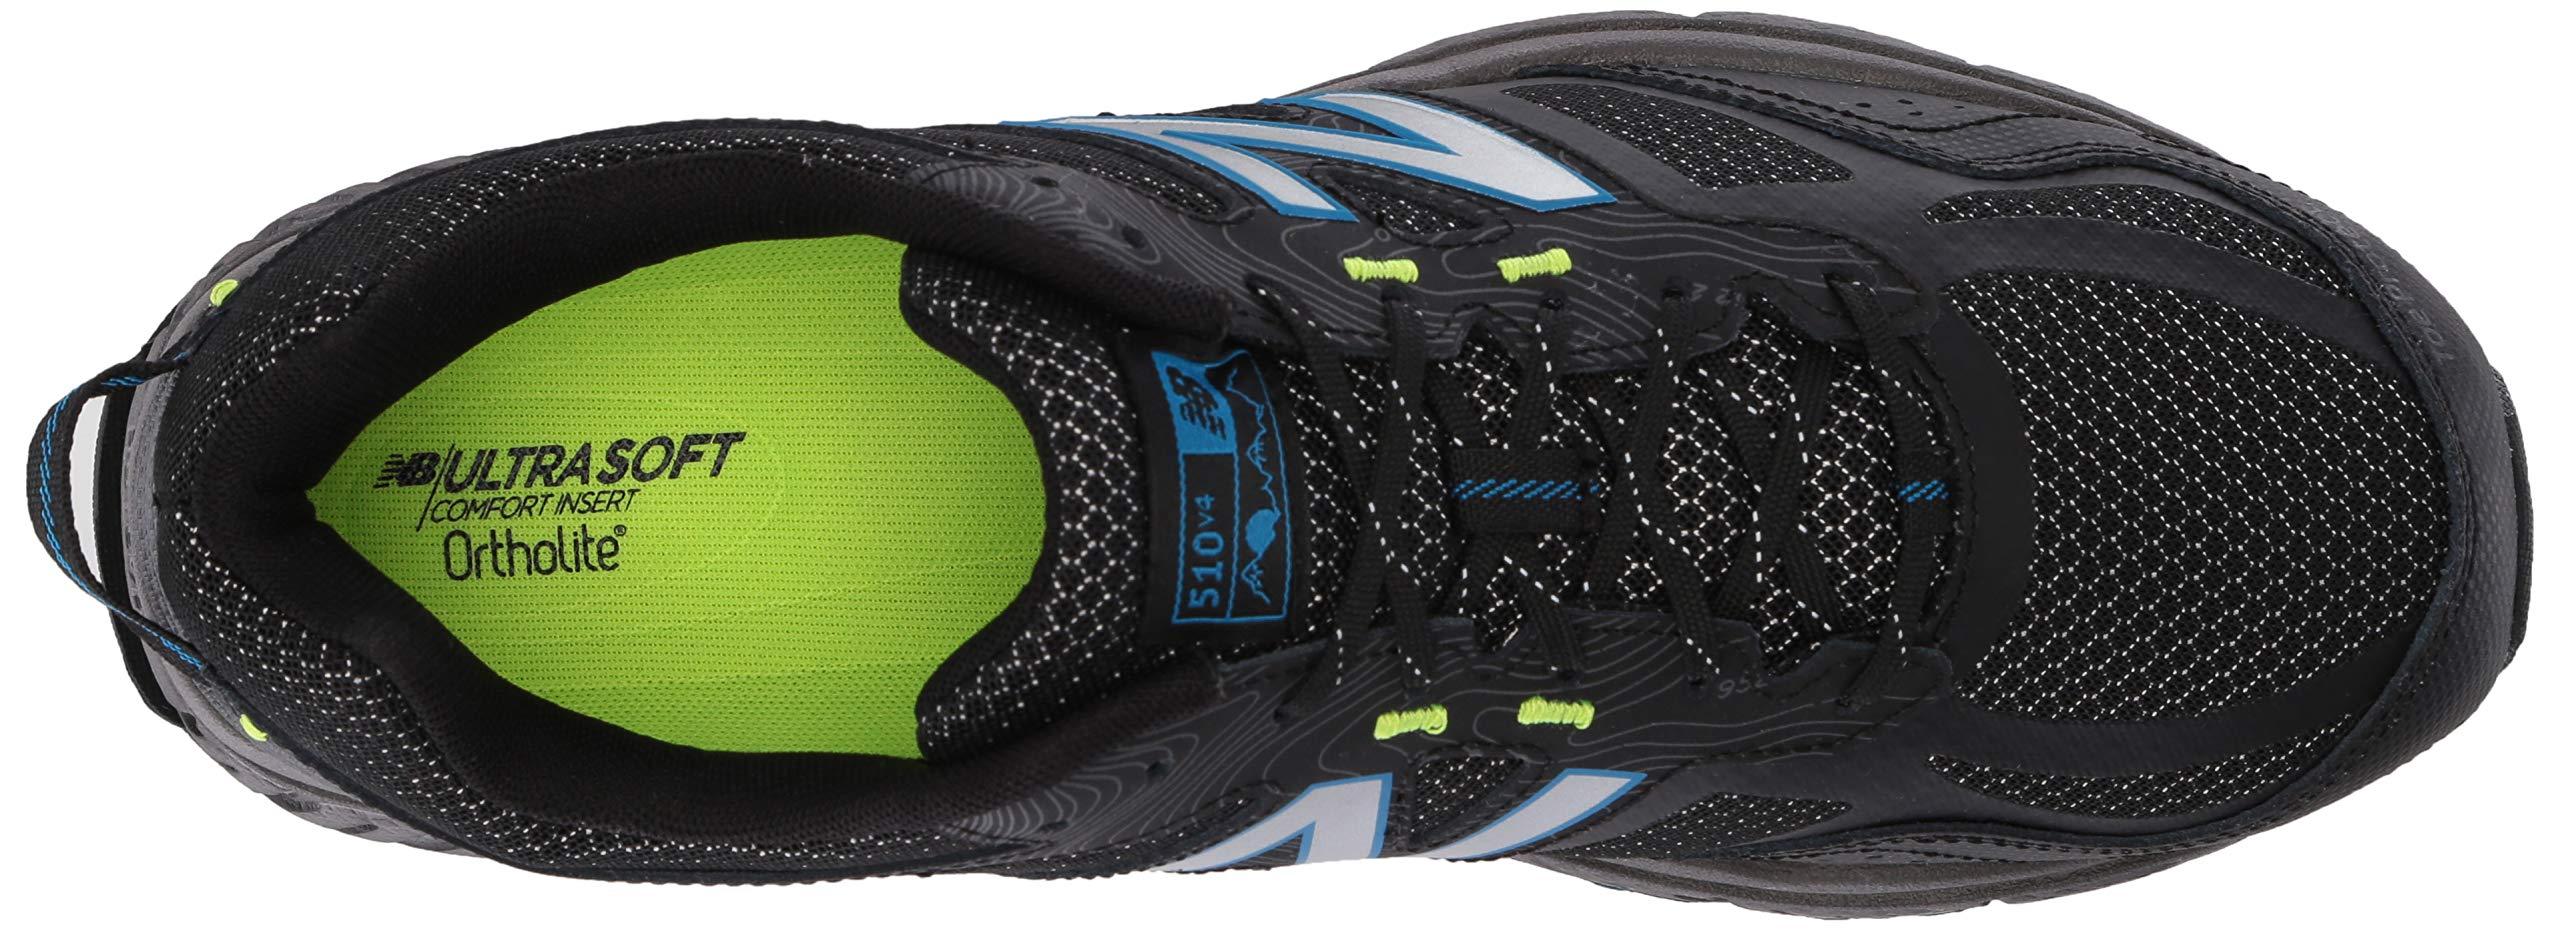 New Balance Men's 510v4 Cushioning Trail Running Shoe, Magnet/Black/Reflective, 7.5 D US by New Balance (Image #8)